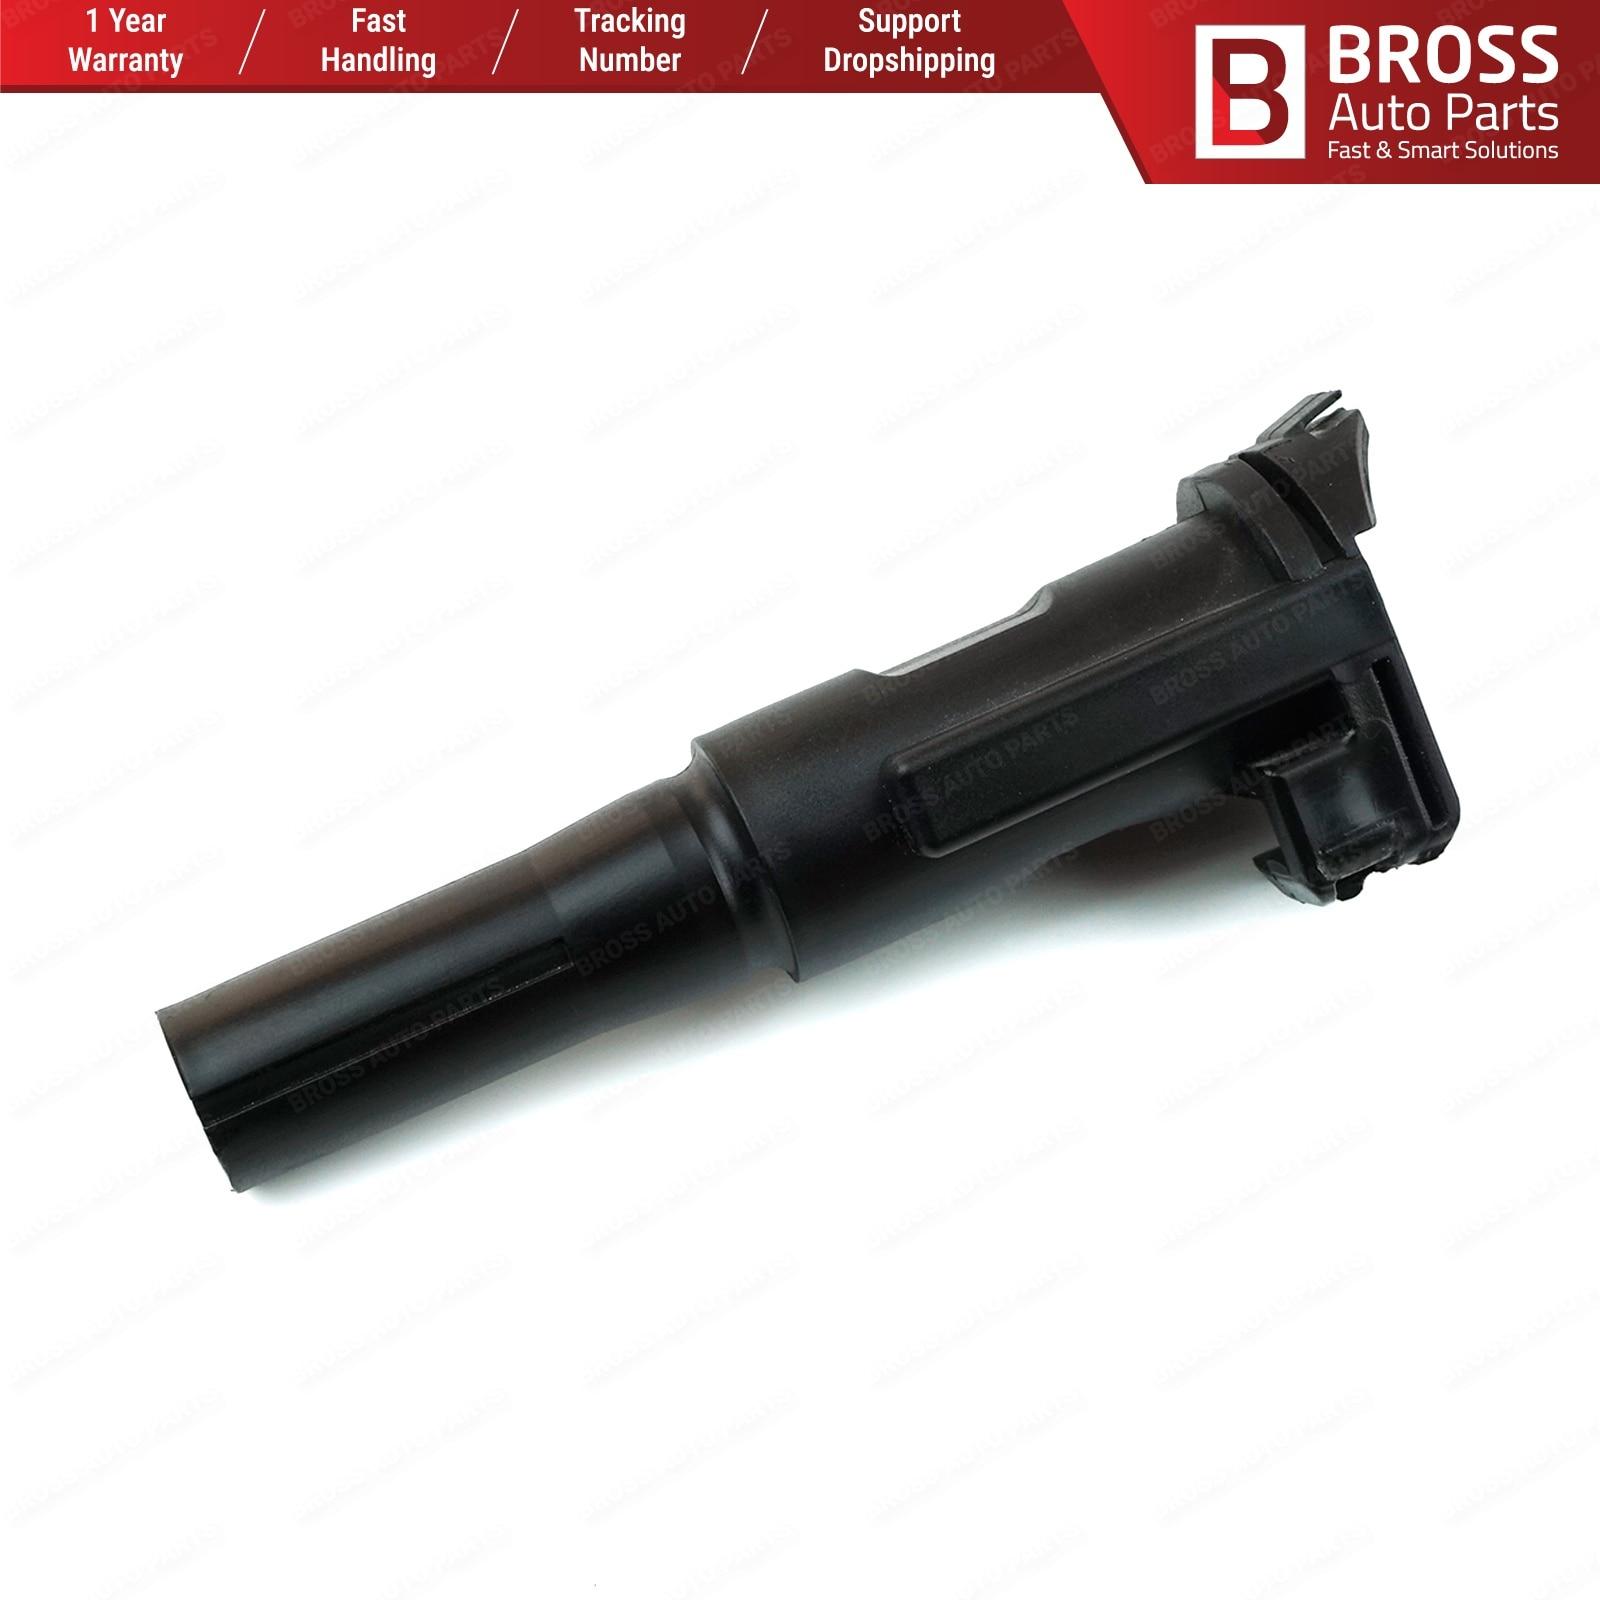 BSP1009 Manual Gearbox  Transmission Drivetrain Gear Selector Shift Stick Lever Gear Retainer 1J0711893 For VW Audi Seat Skoda